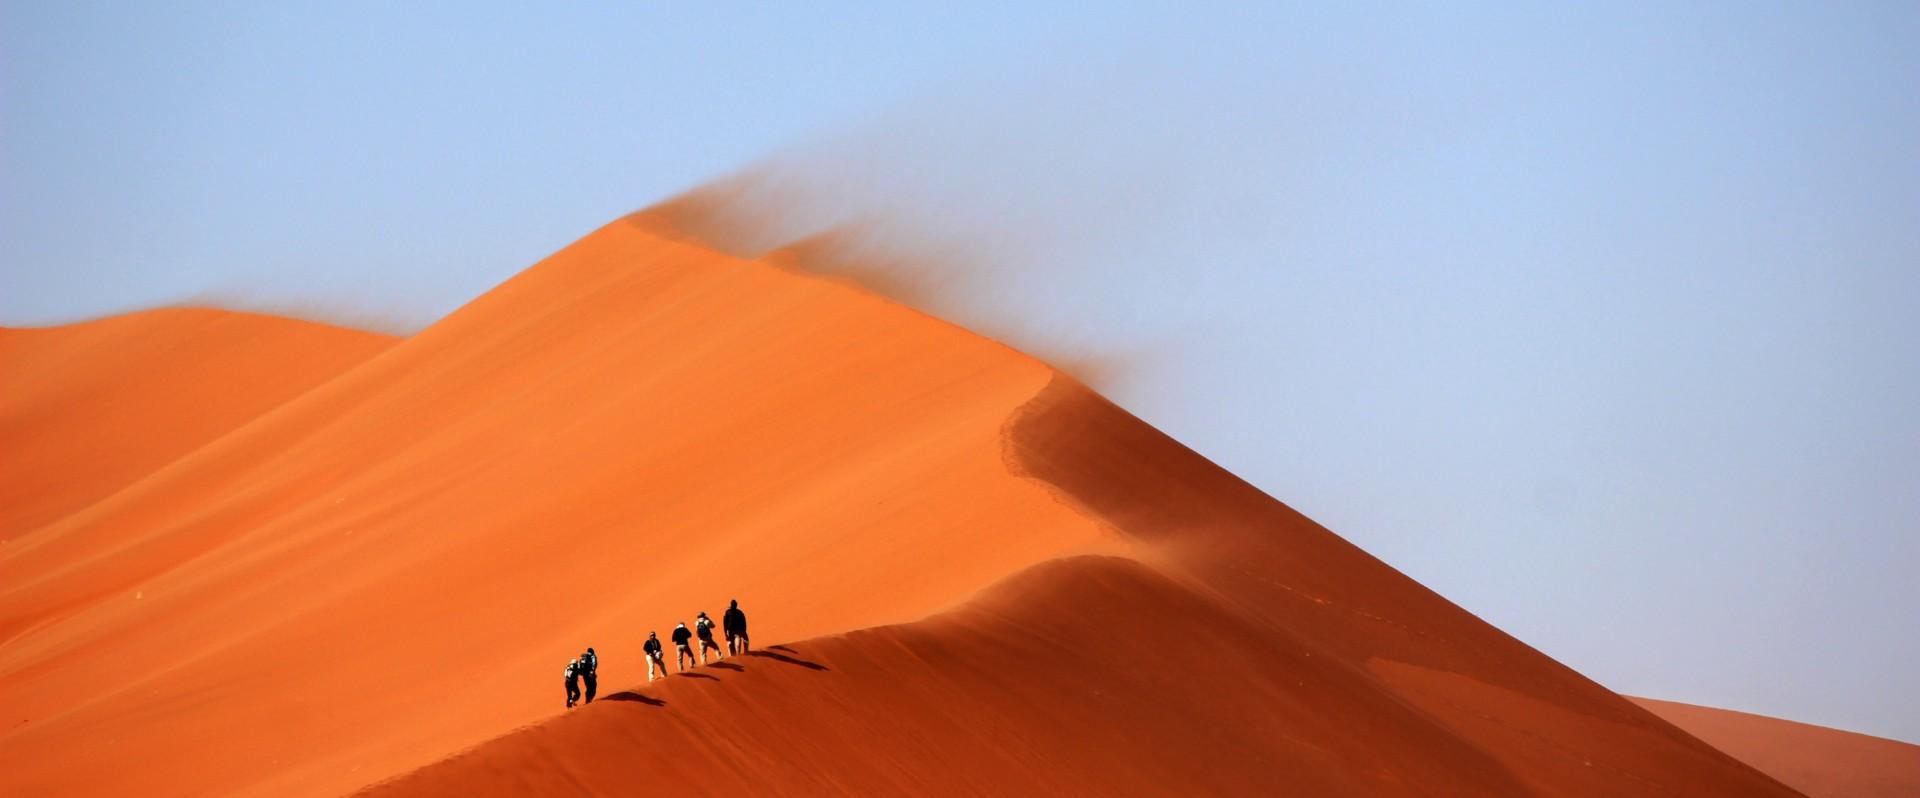 People trekking across a sand dune